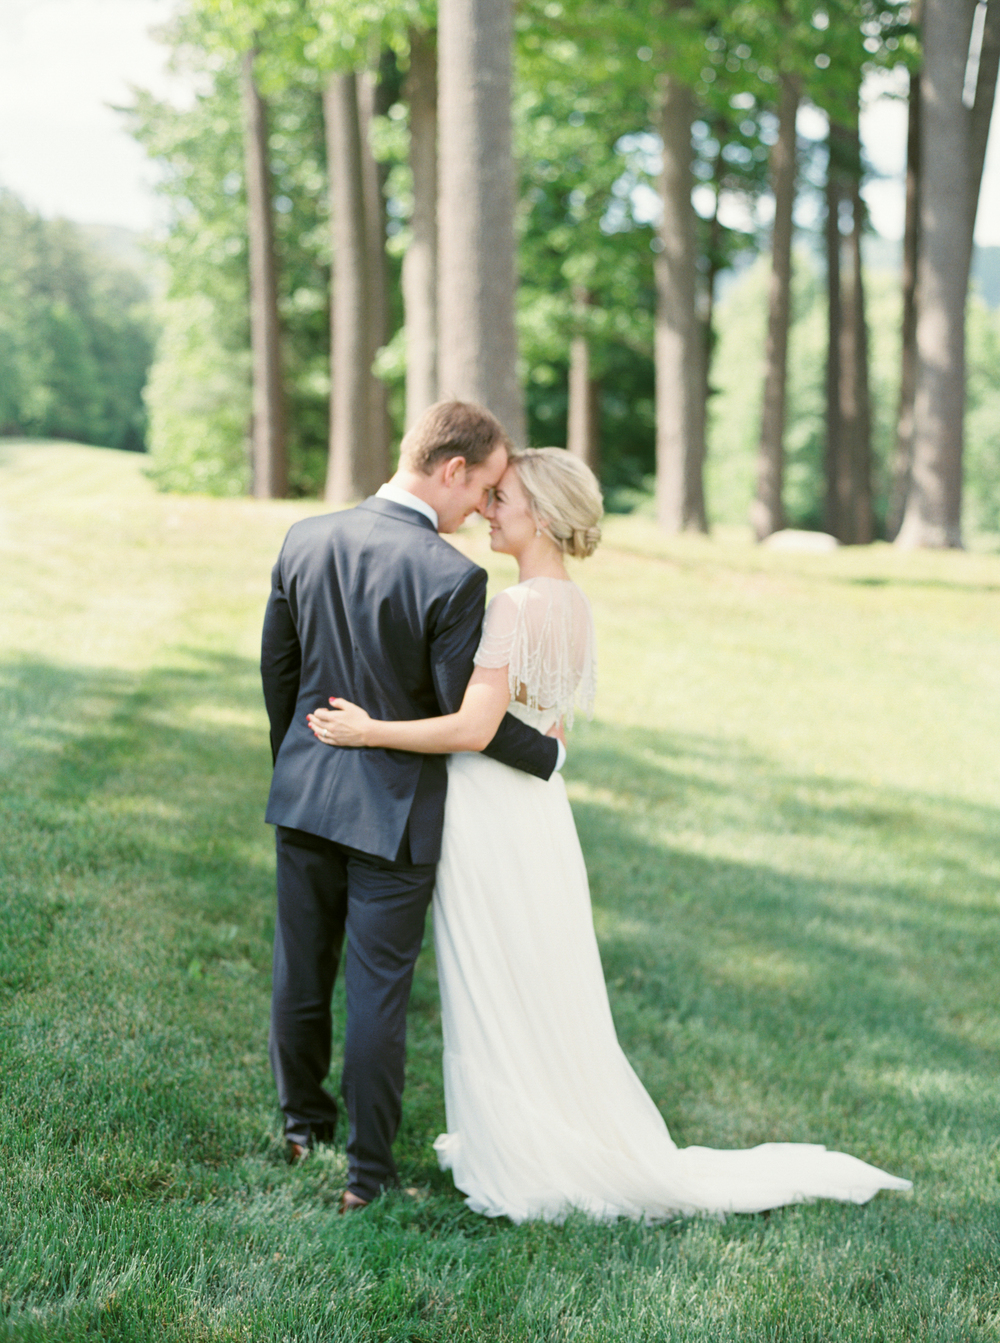 Jen & Russel | Sawyer Baird (9 of 19).JPG